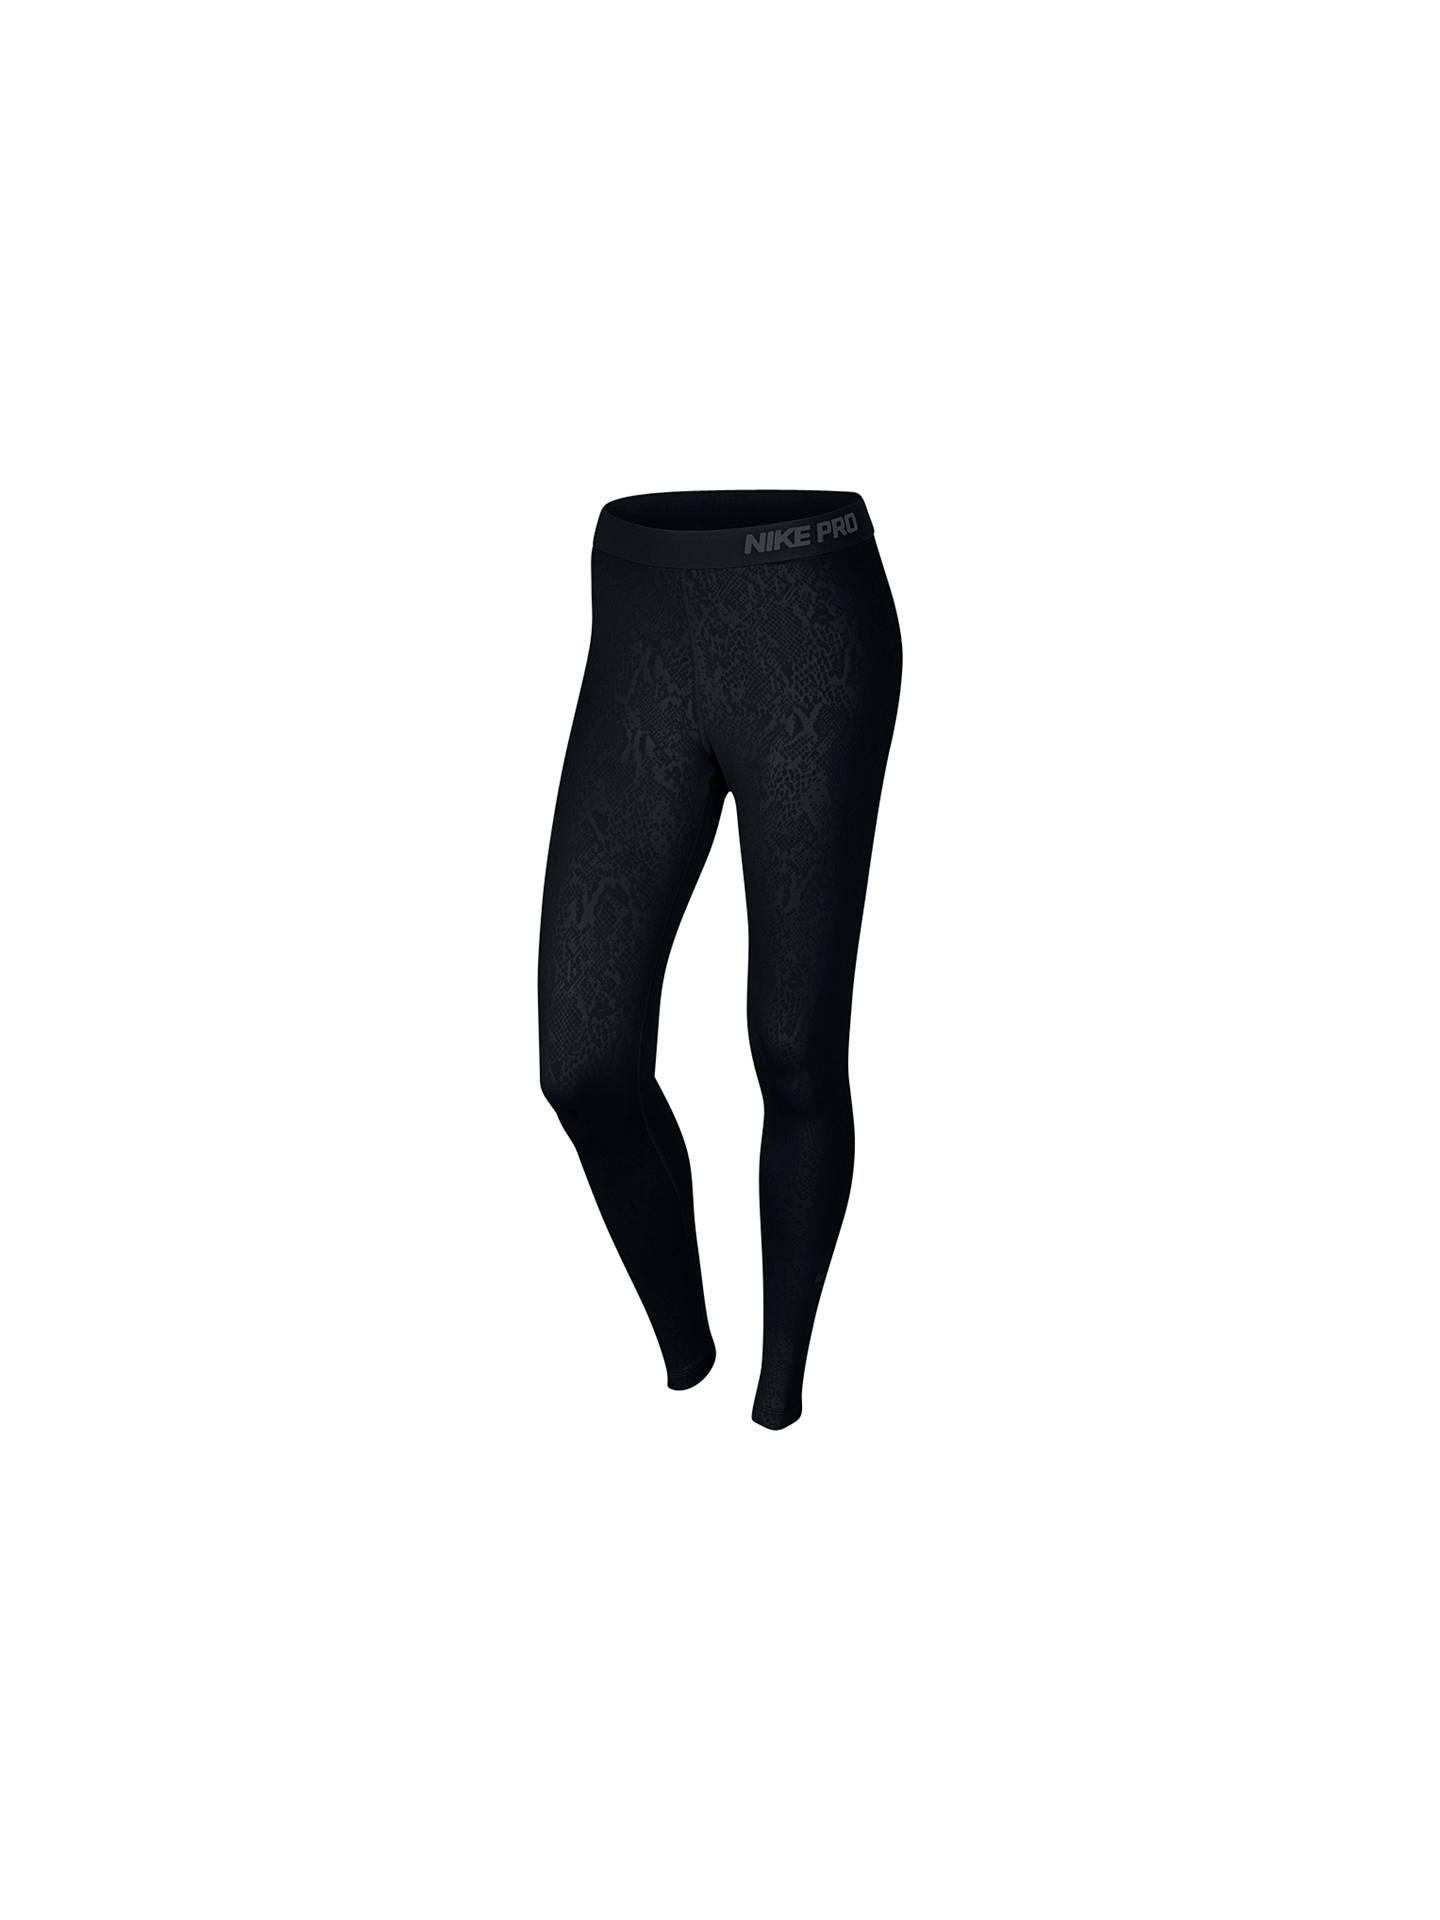 d8d12376683d02 Buy Nike Pro Warm Embossed Vixen Running Tights, Black, XS Online at  johnlewis.